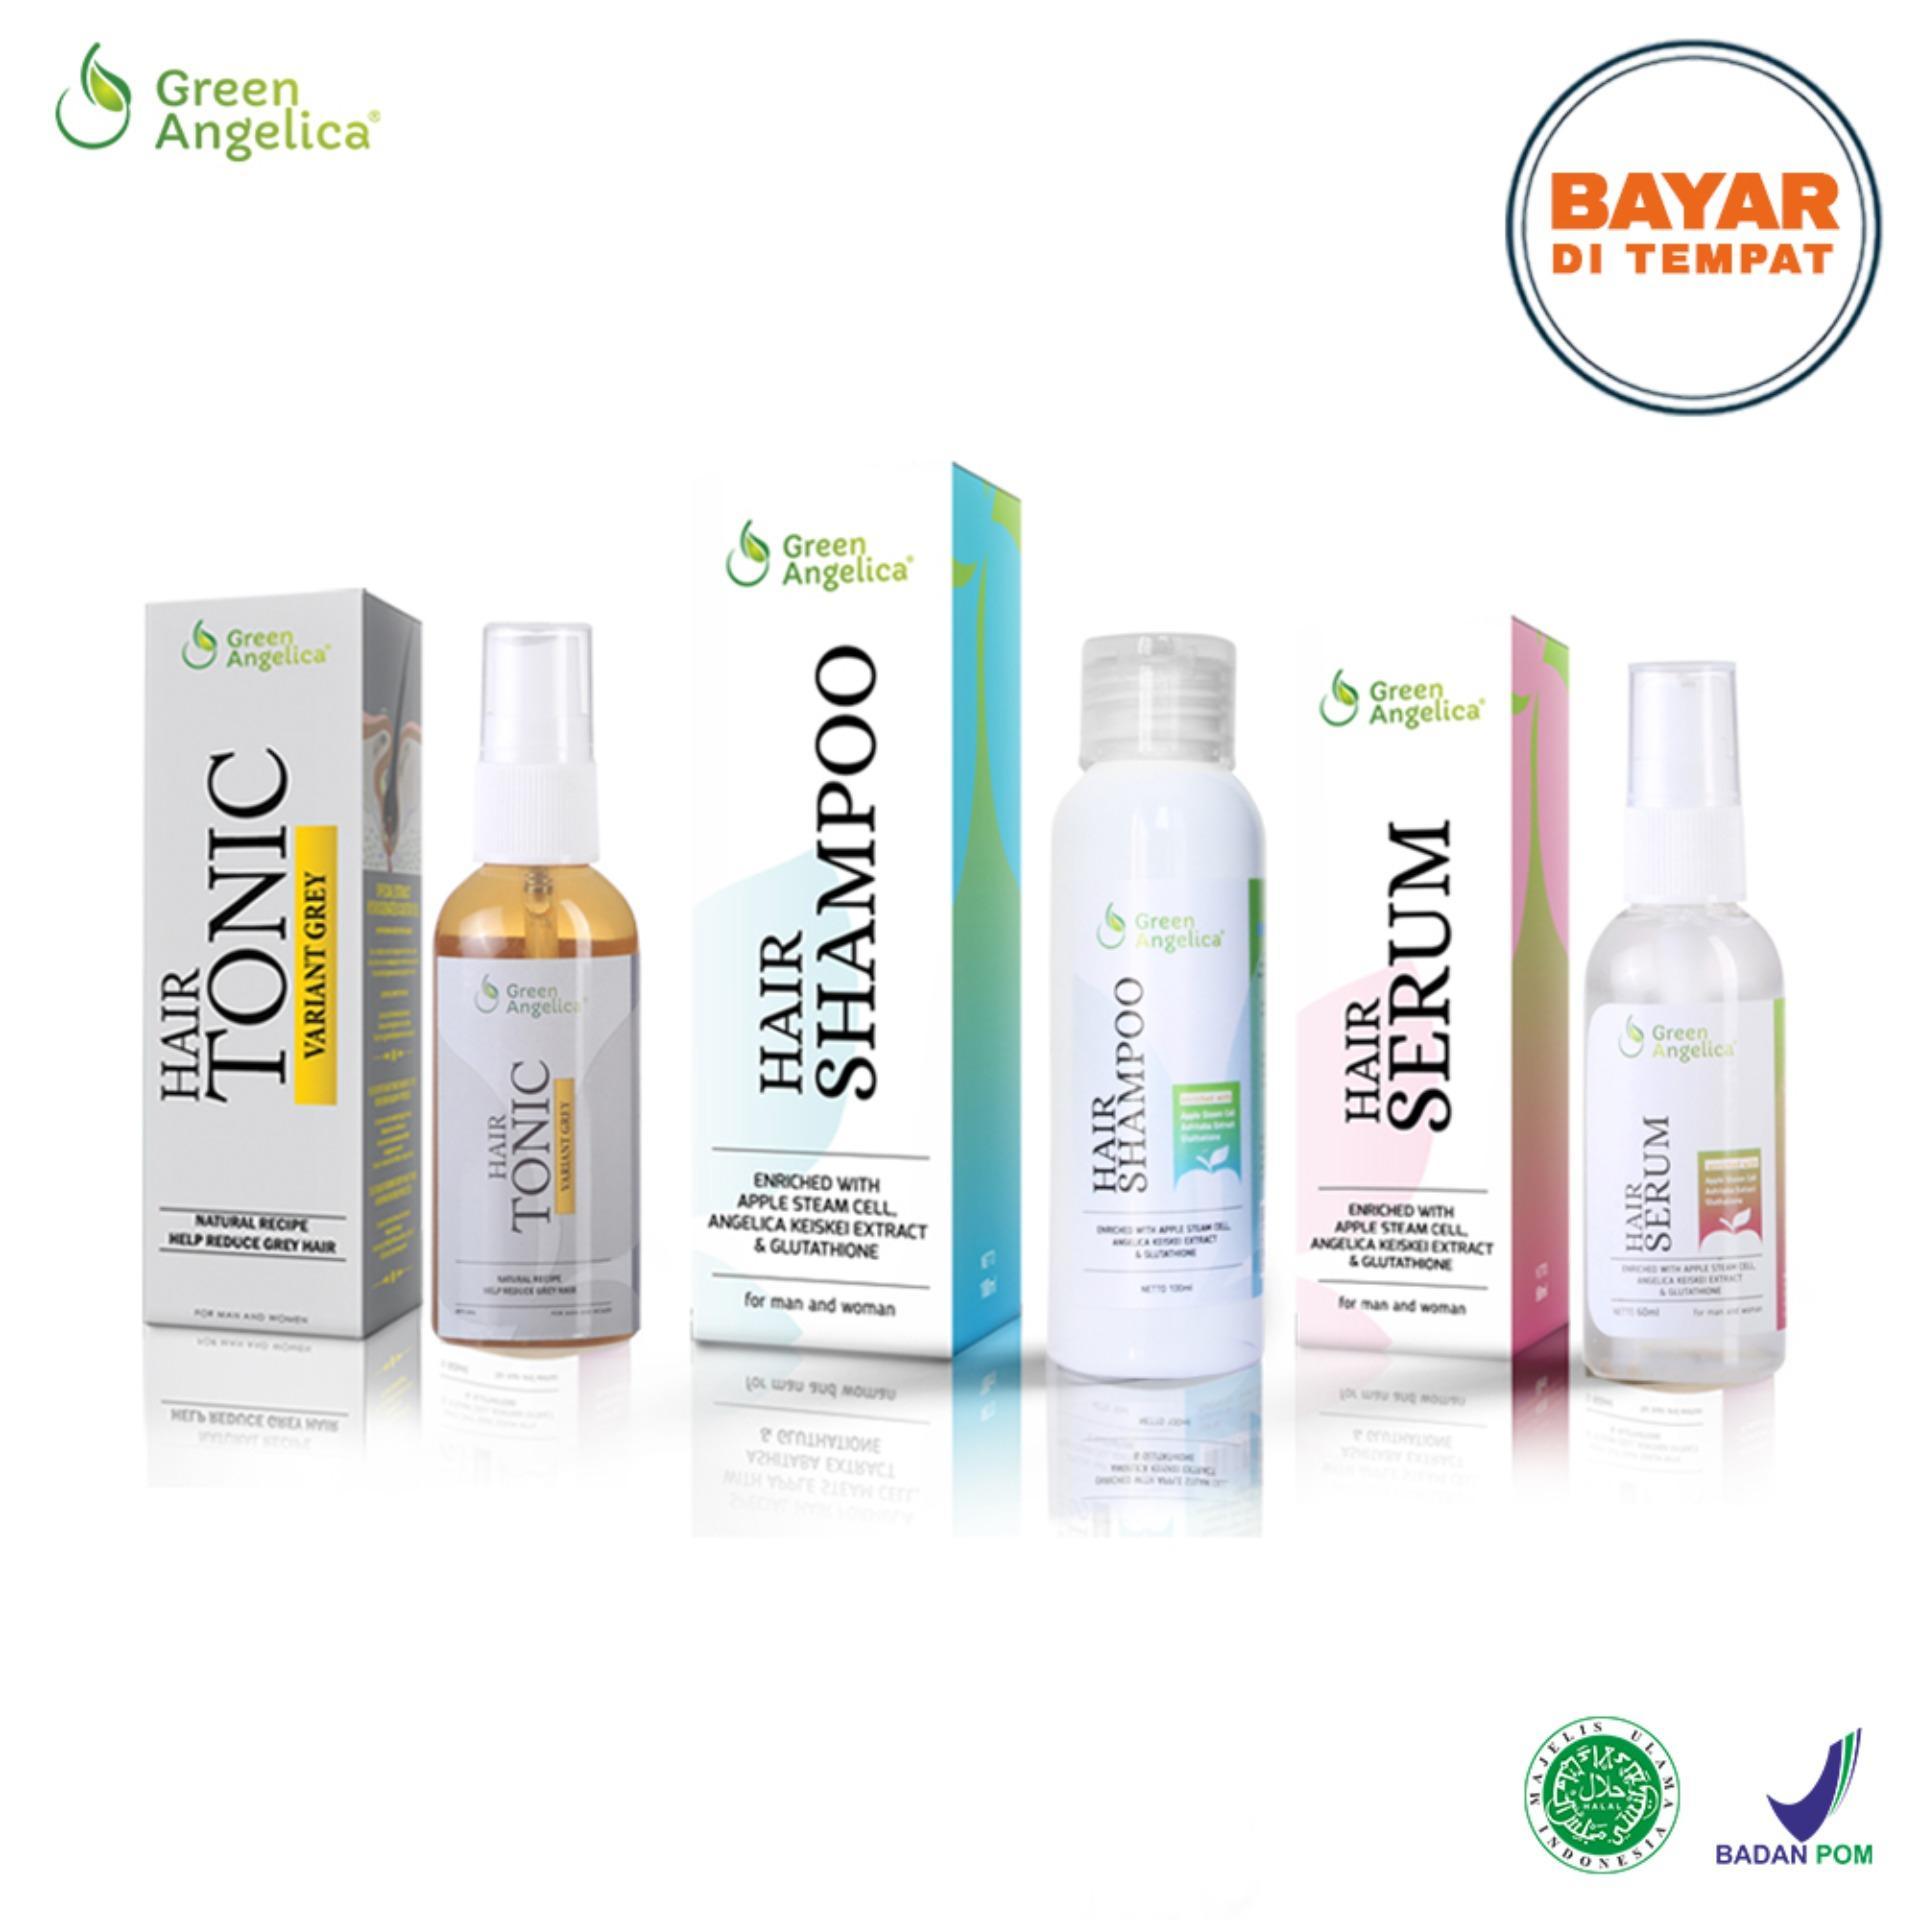 Paket Obat Penghitam Uban / Penghilang Uban Maksimal ( Hair Tonic Variant Grey , Hair Serum , Hair Shampo ) Original 100% *FREE POUCH* Green Angelica